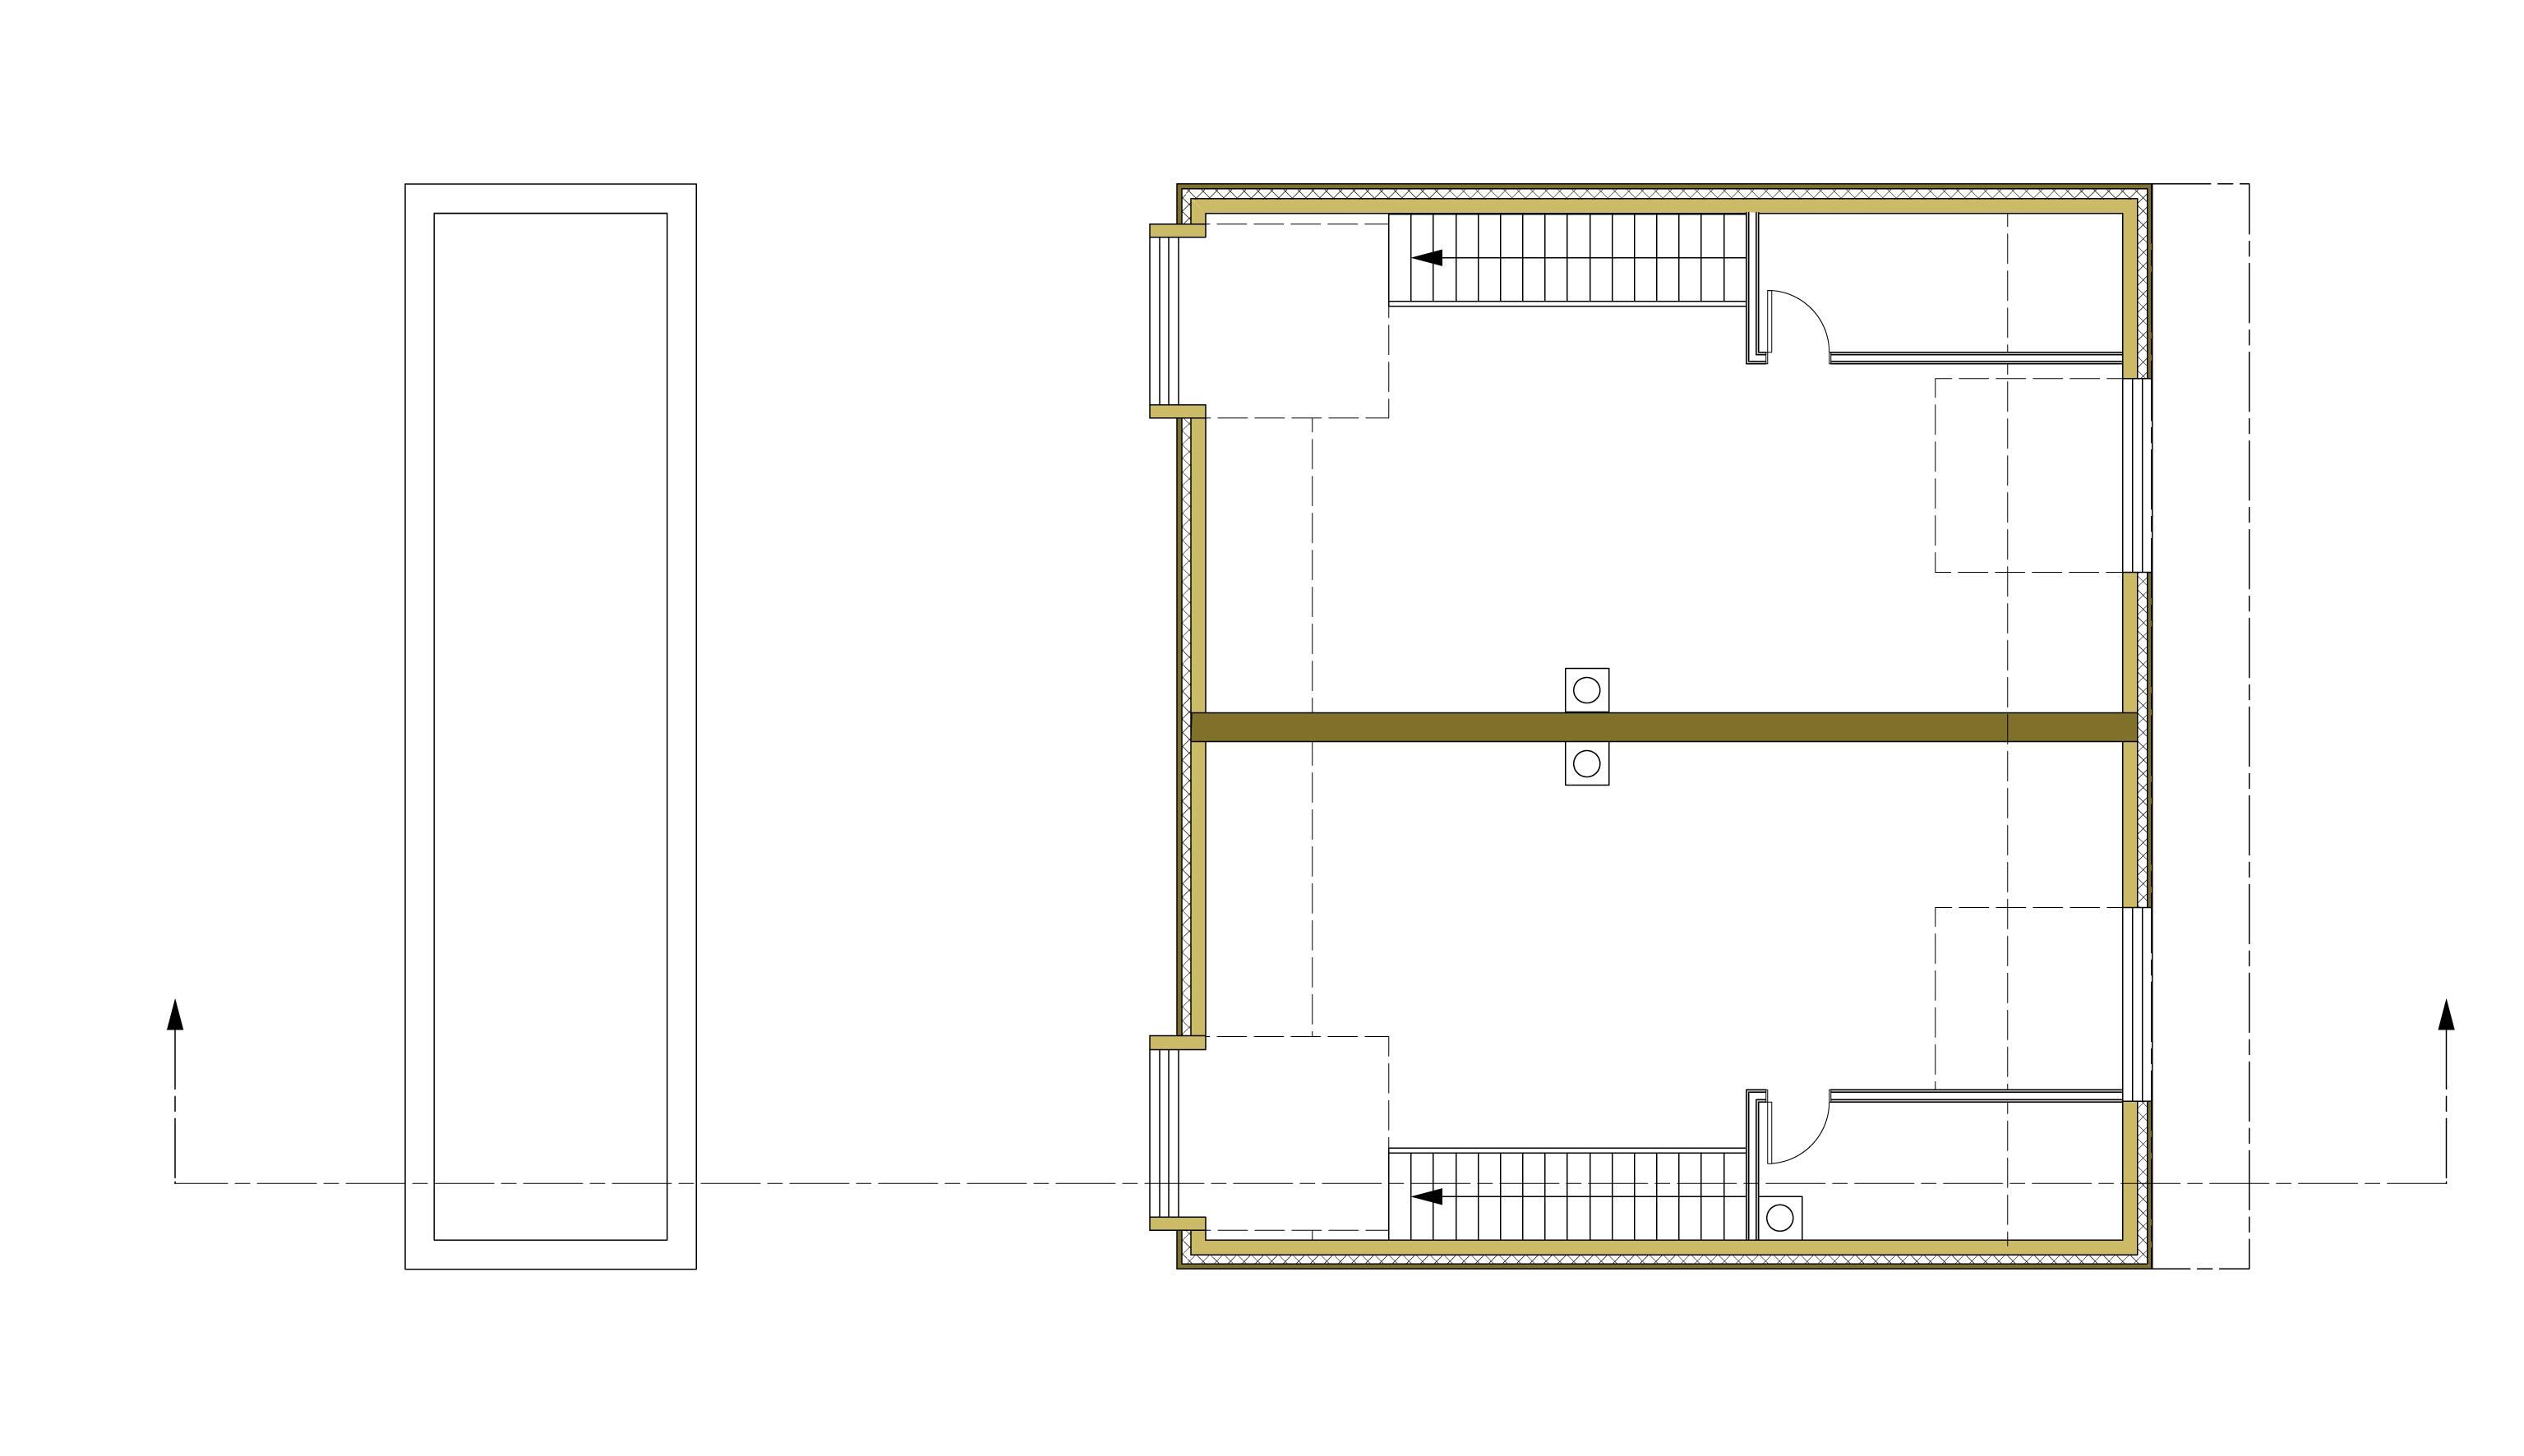 wohnprojekte portal wohnen am kesselberg. Black Bedroom Furniture Sets. Home Design Ideas